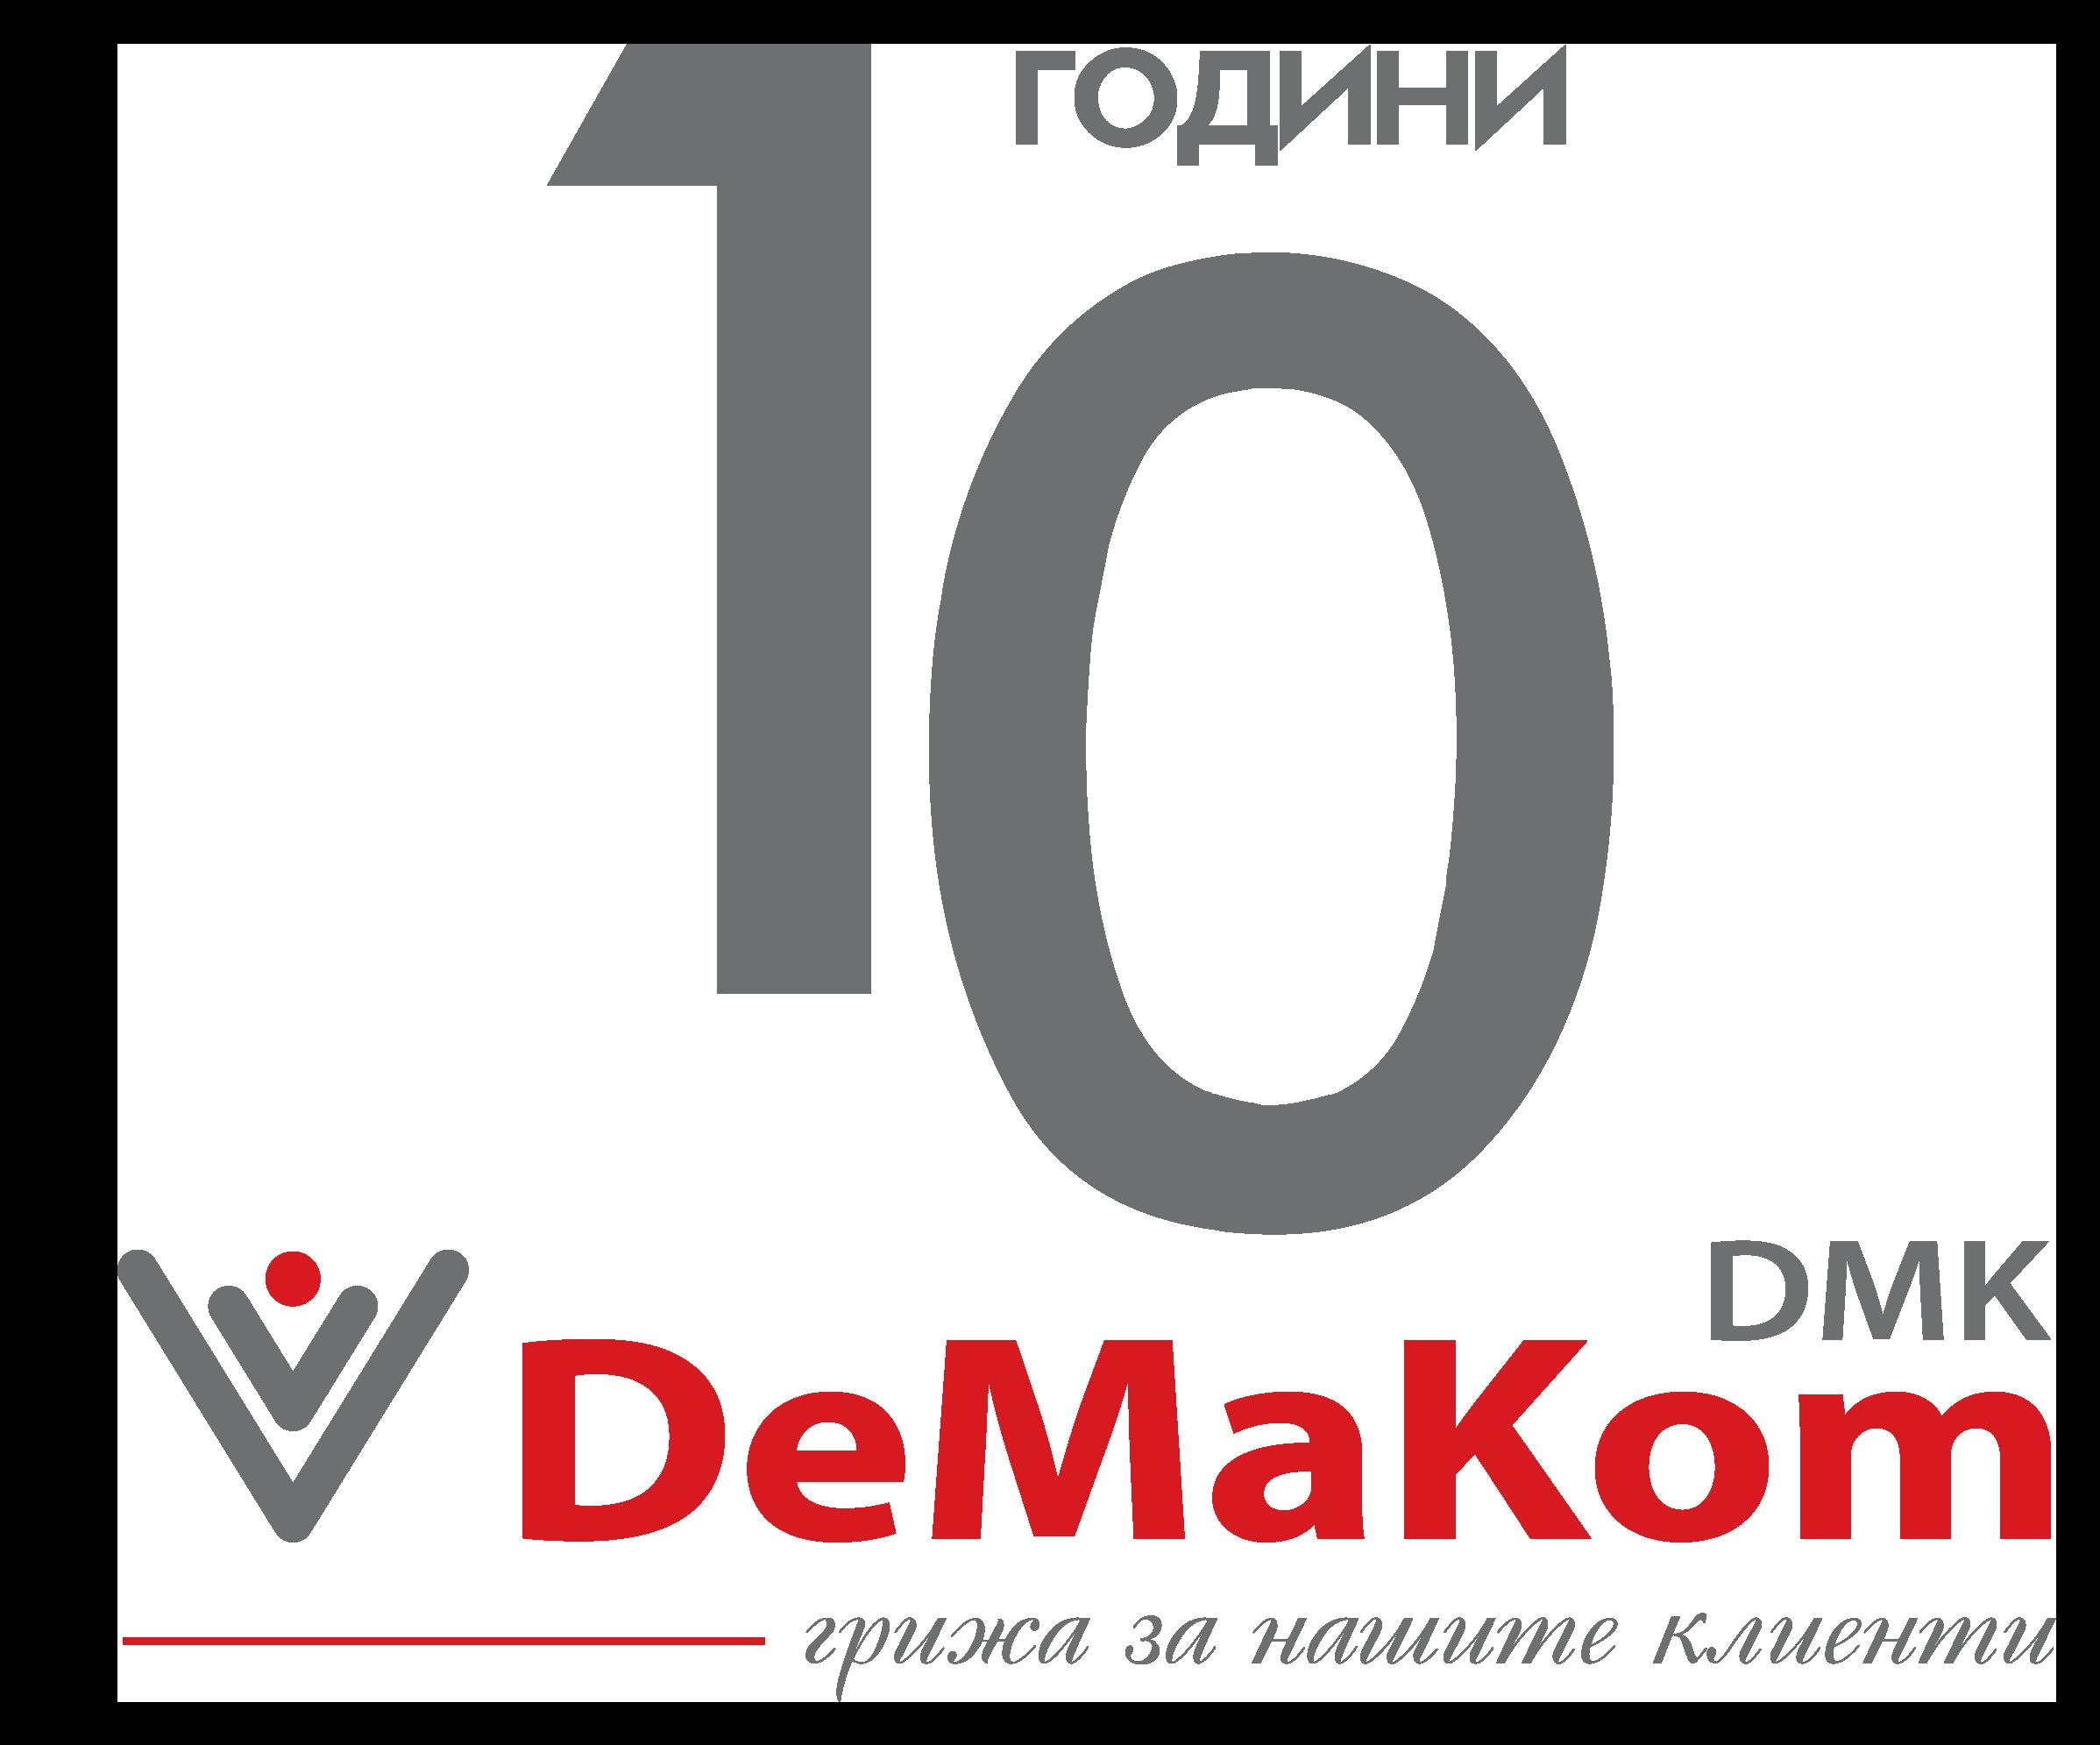 Demakom